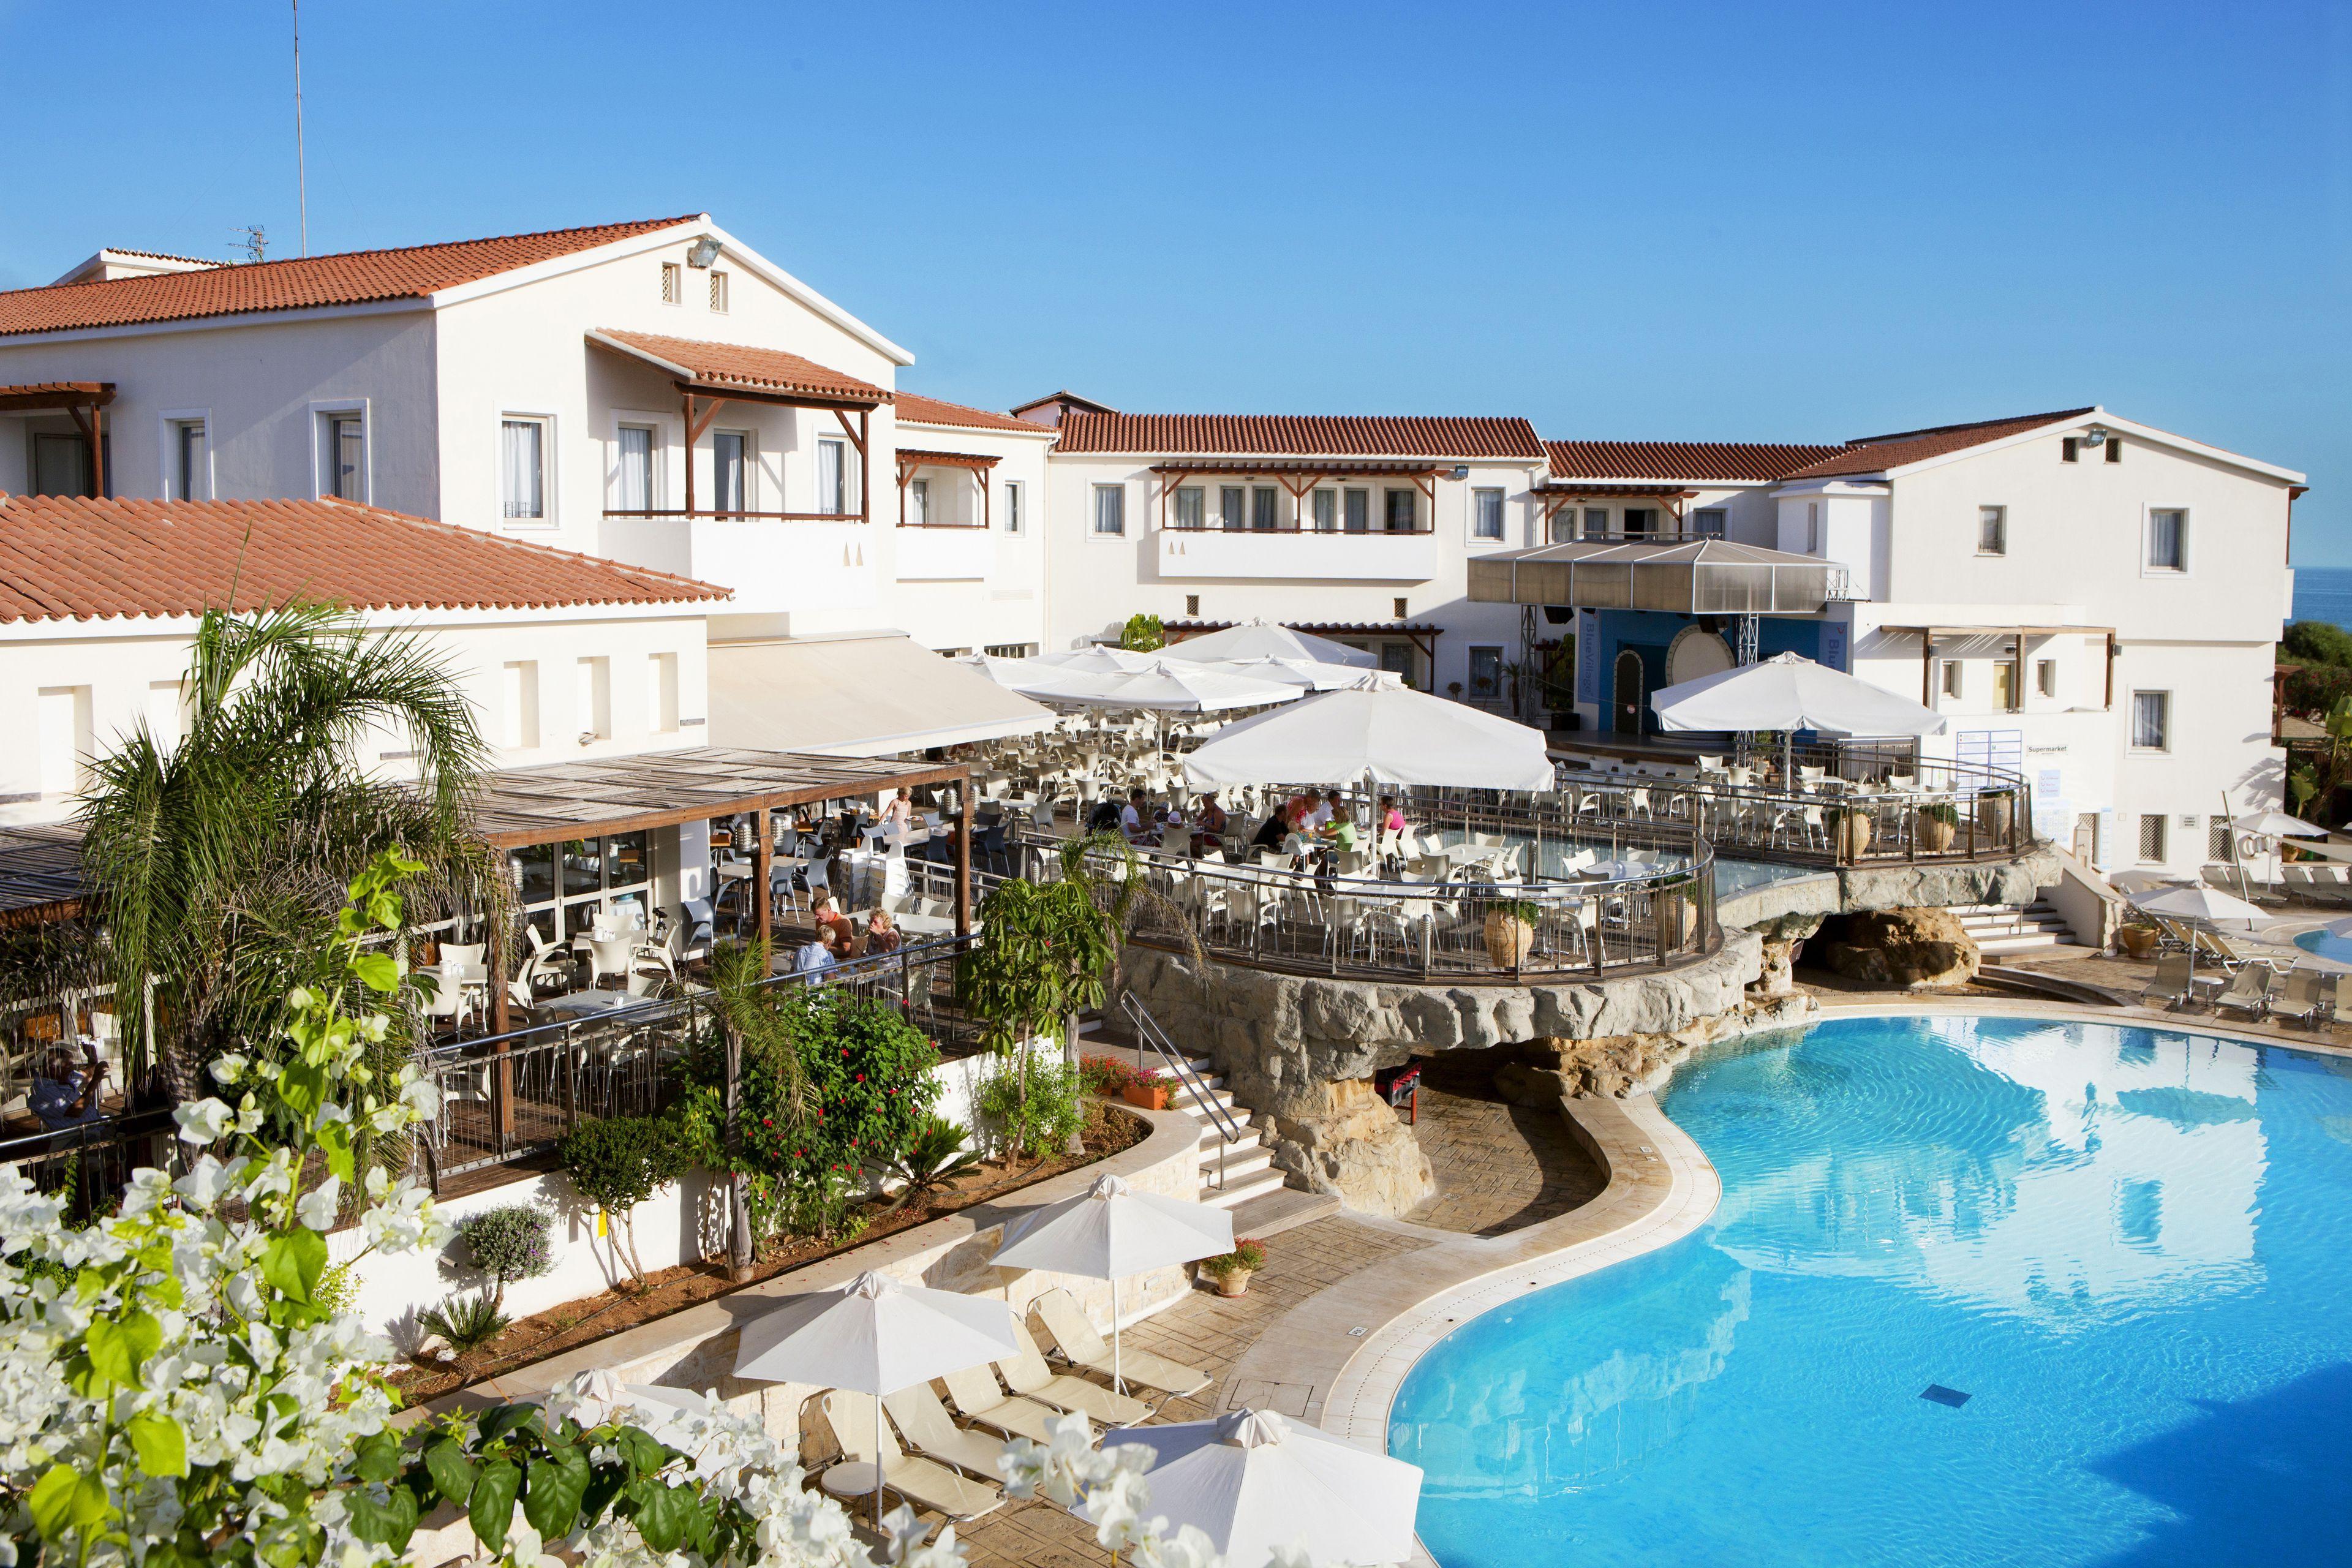 Courtesy of Louis Althea Beach Hotel / Expedia